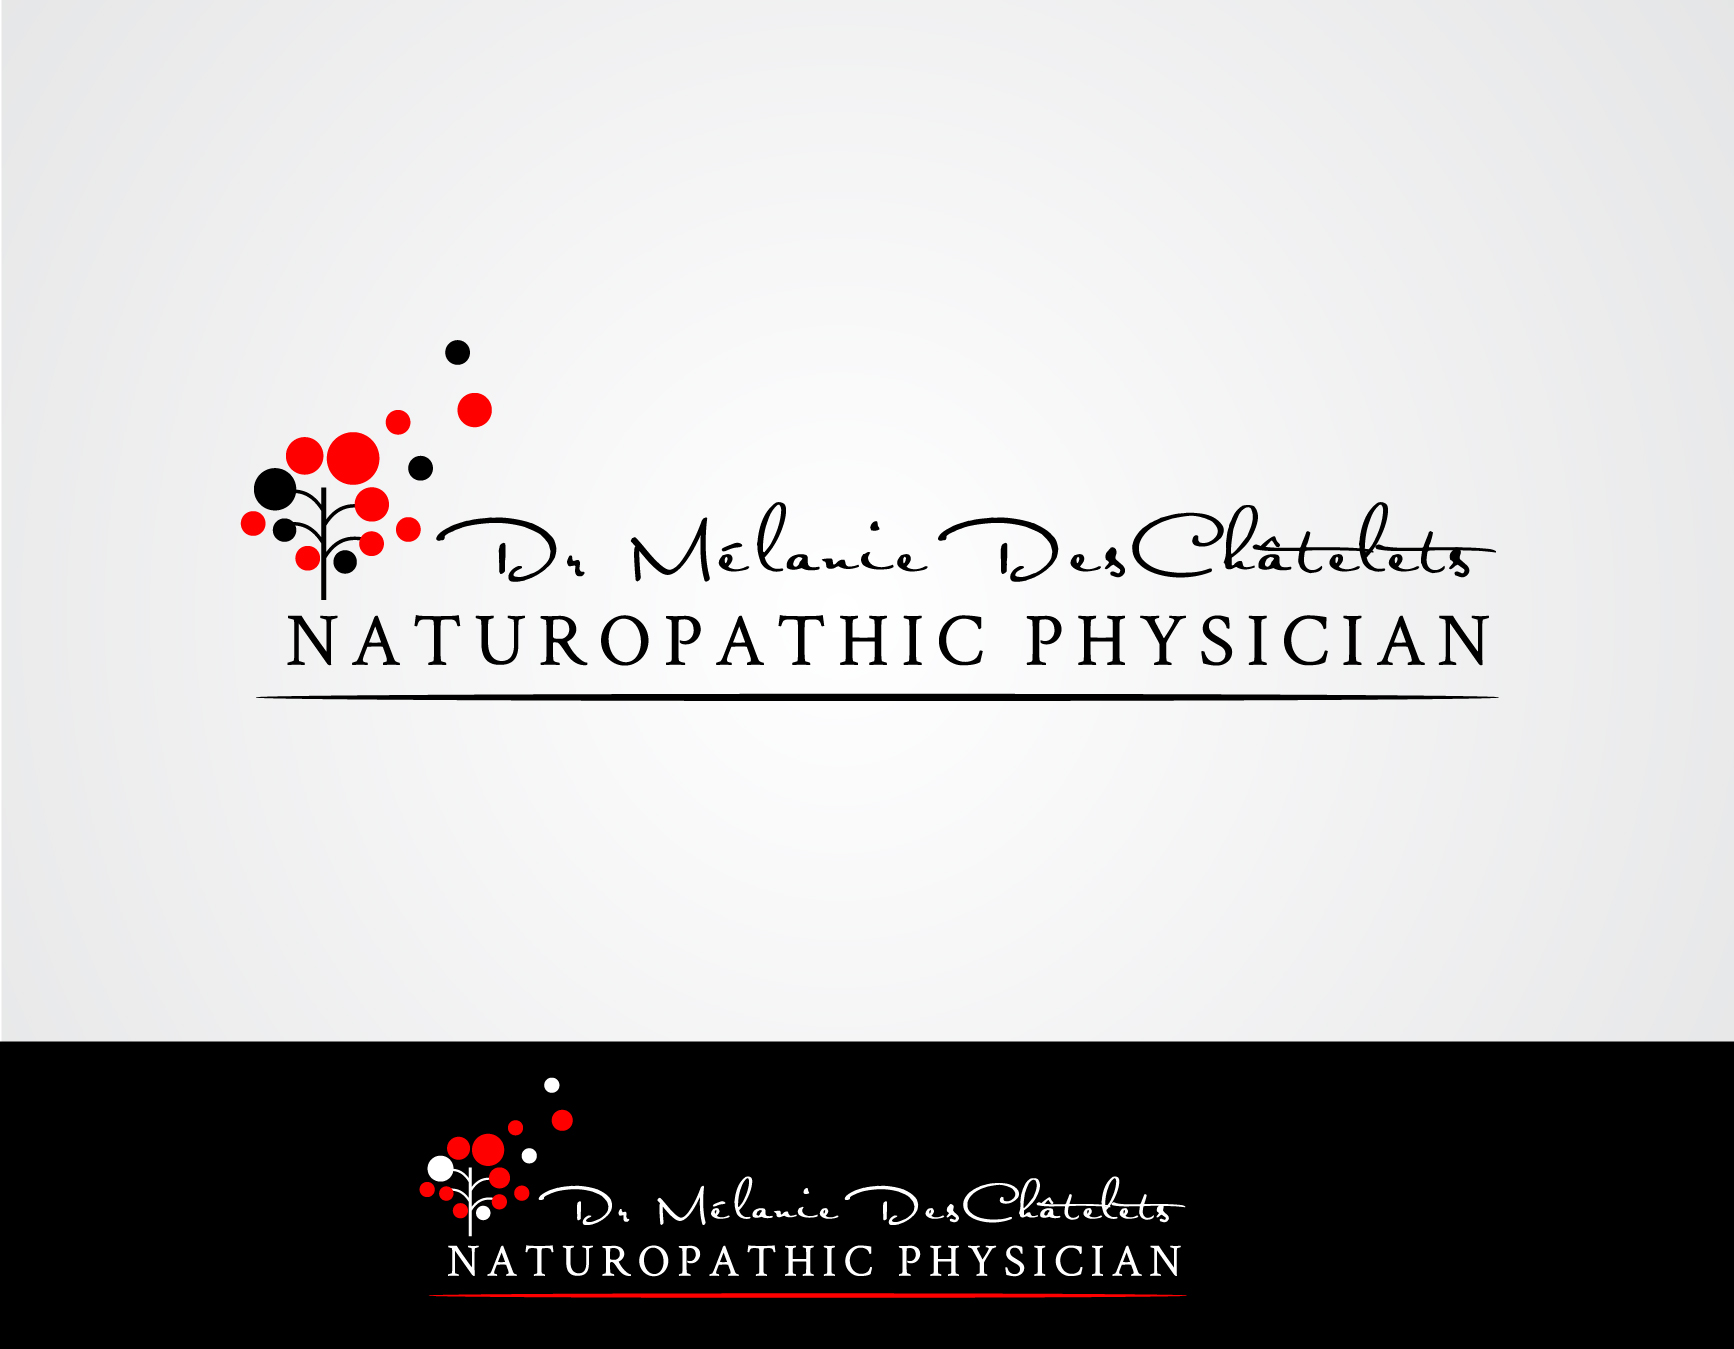 Logo Design by Darina Dimitrova - Entry No. 189 in the Logo Design Contest Artistic Logo Design for Dr Mélanie DesChâtelets.